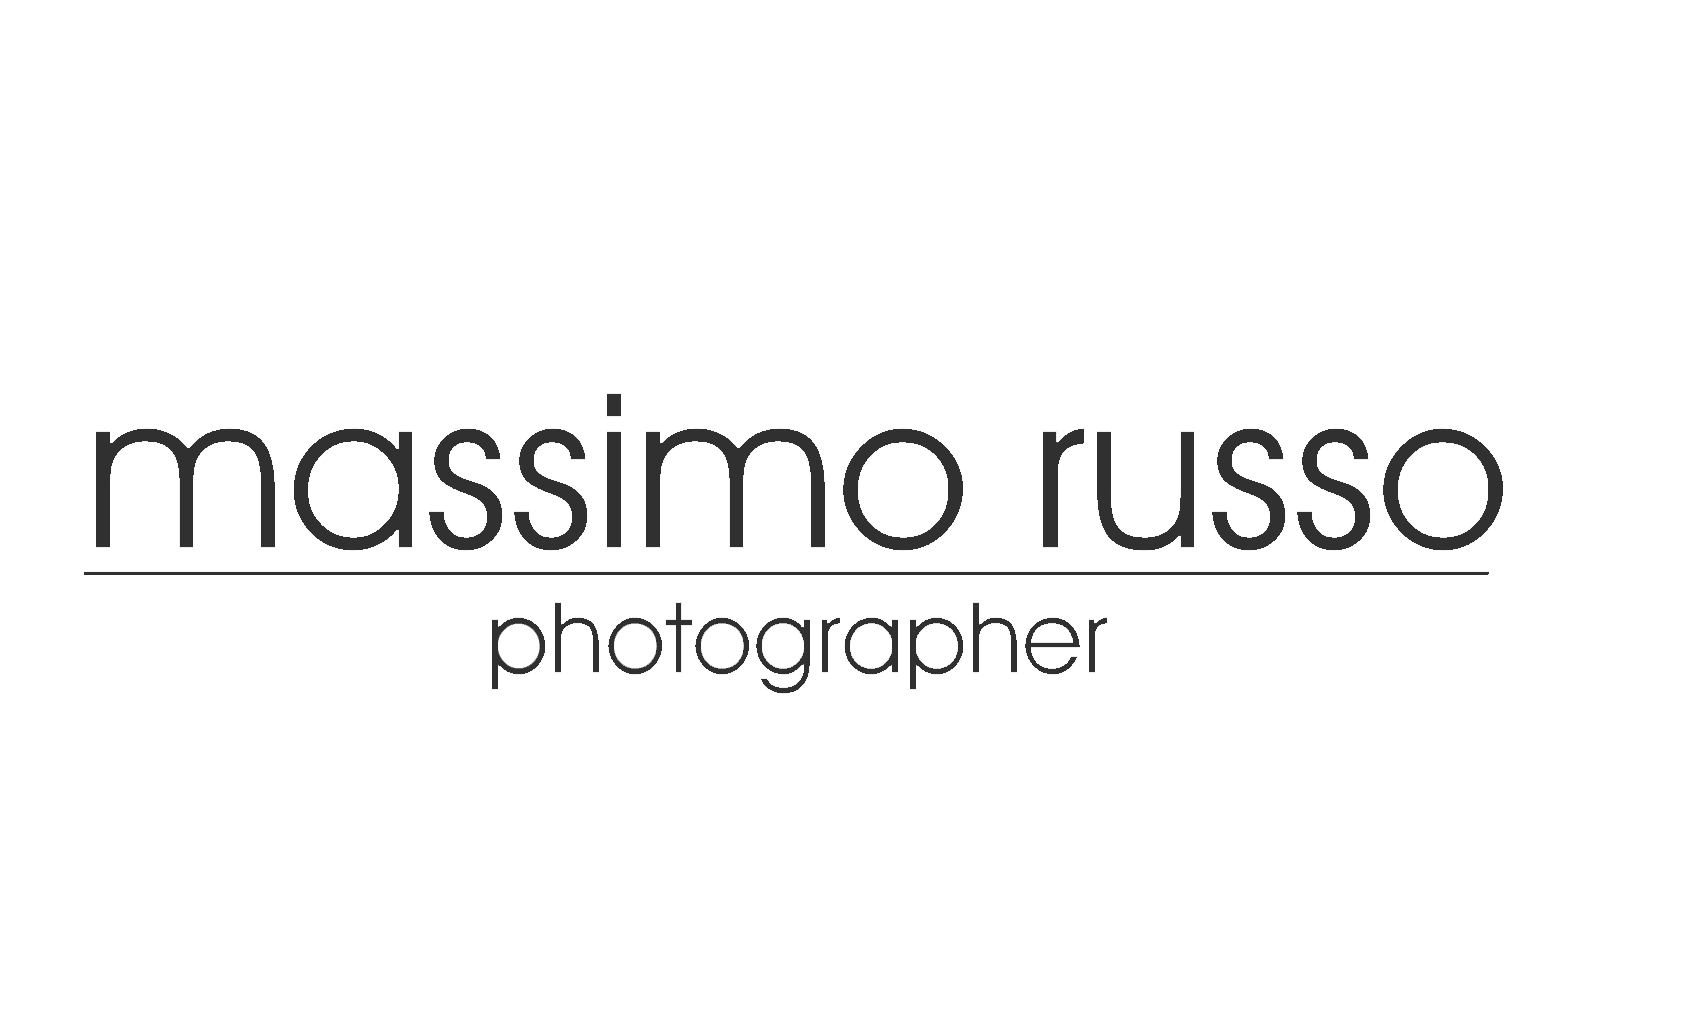 massimo russo photographer